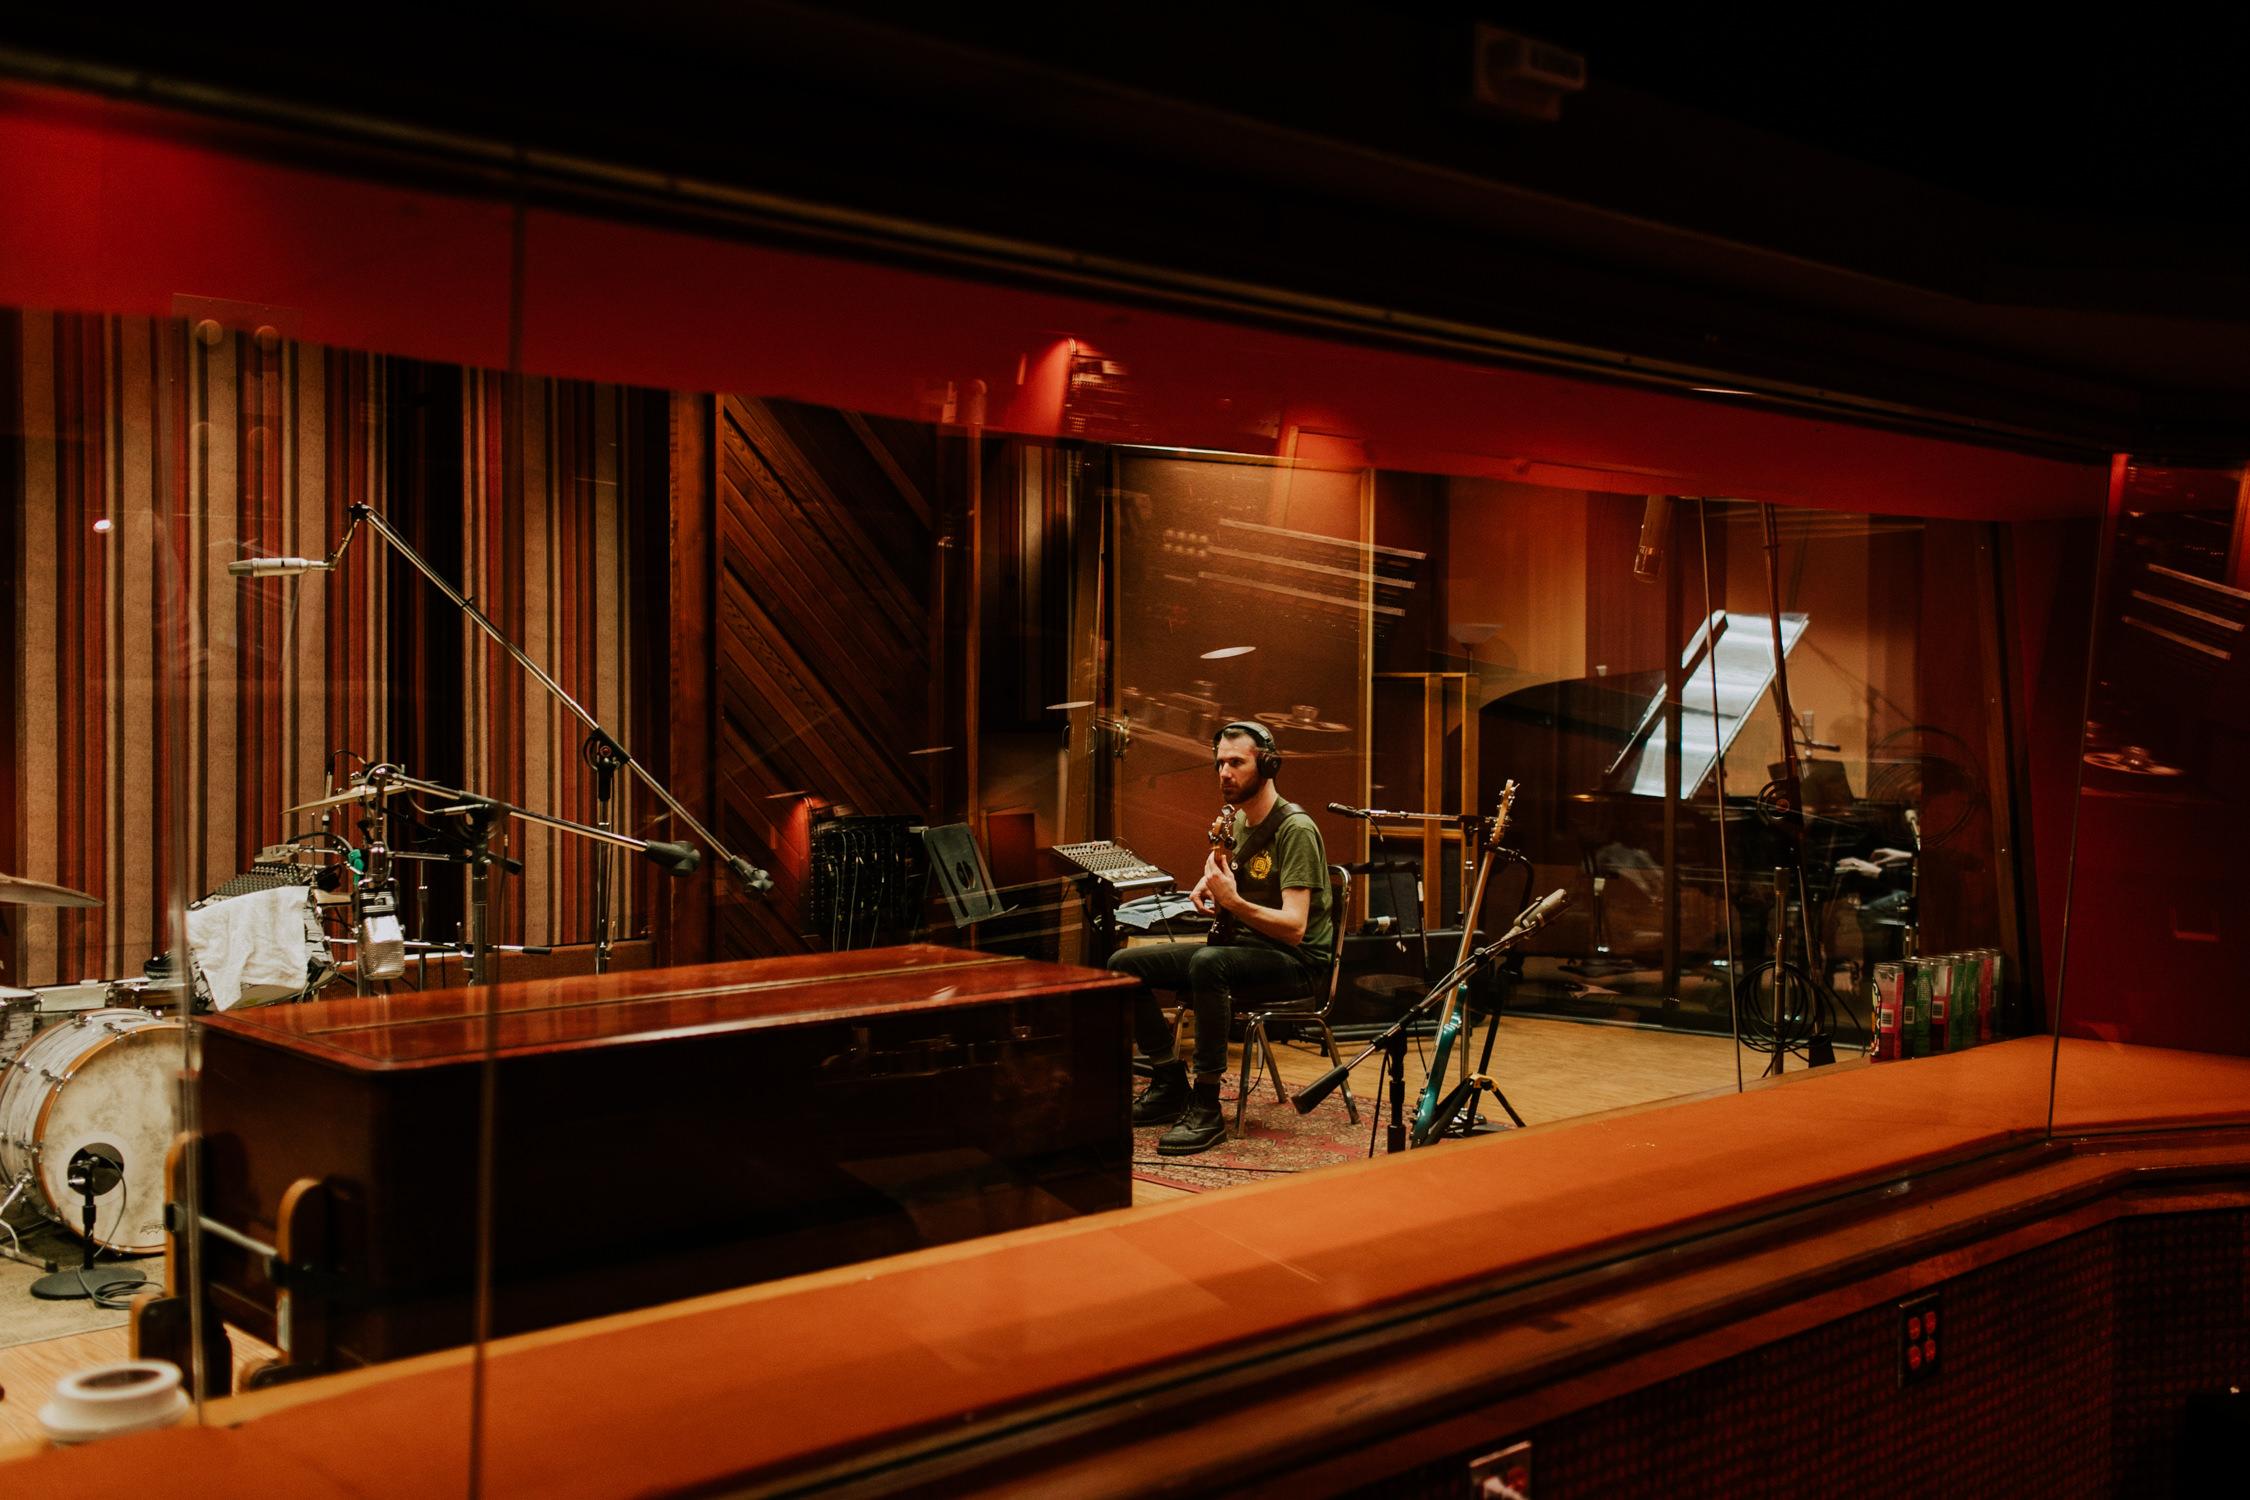 russ-flynn-sunset-sound-recording-session-bts-AnnaLeeMedia